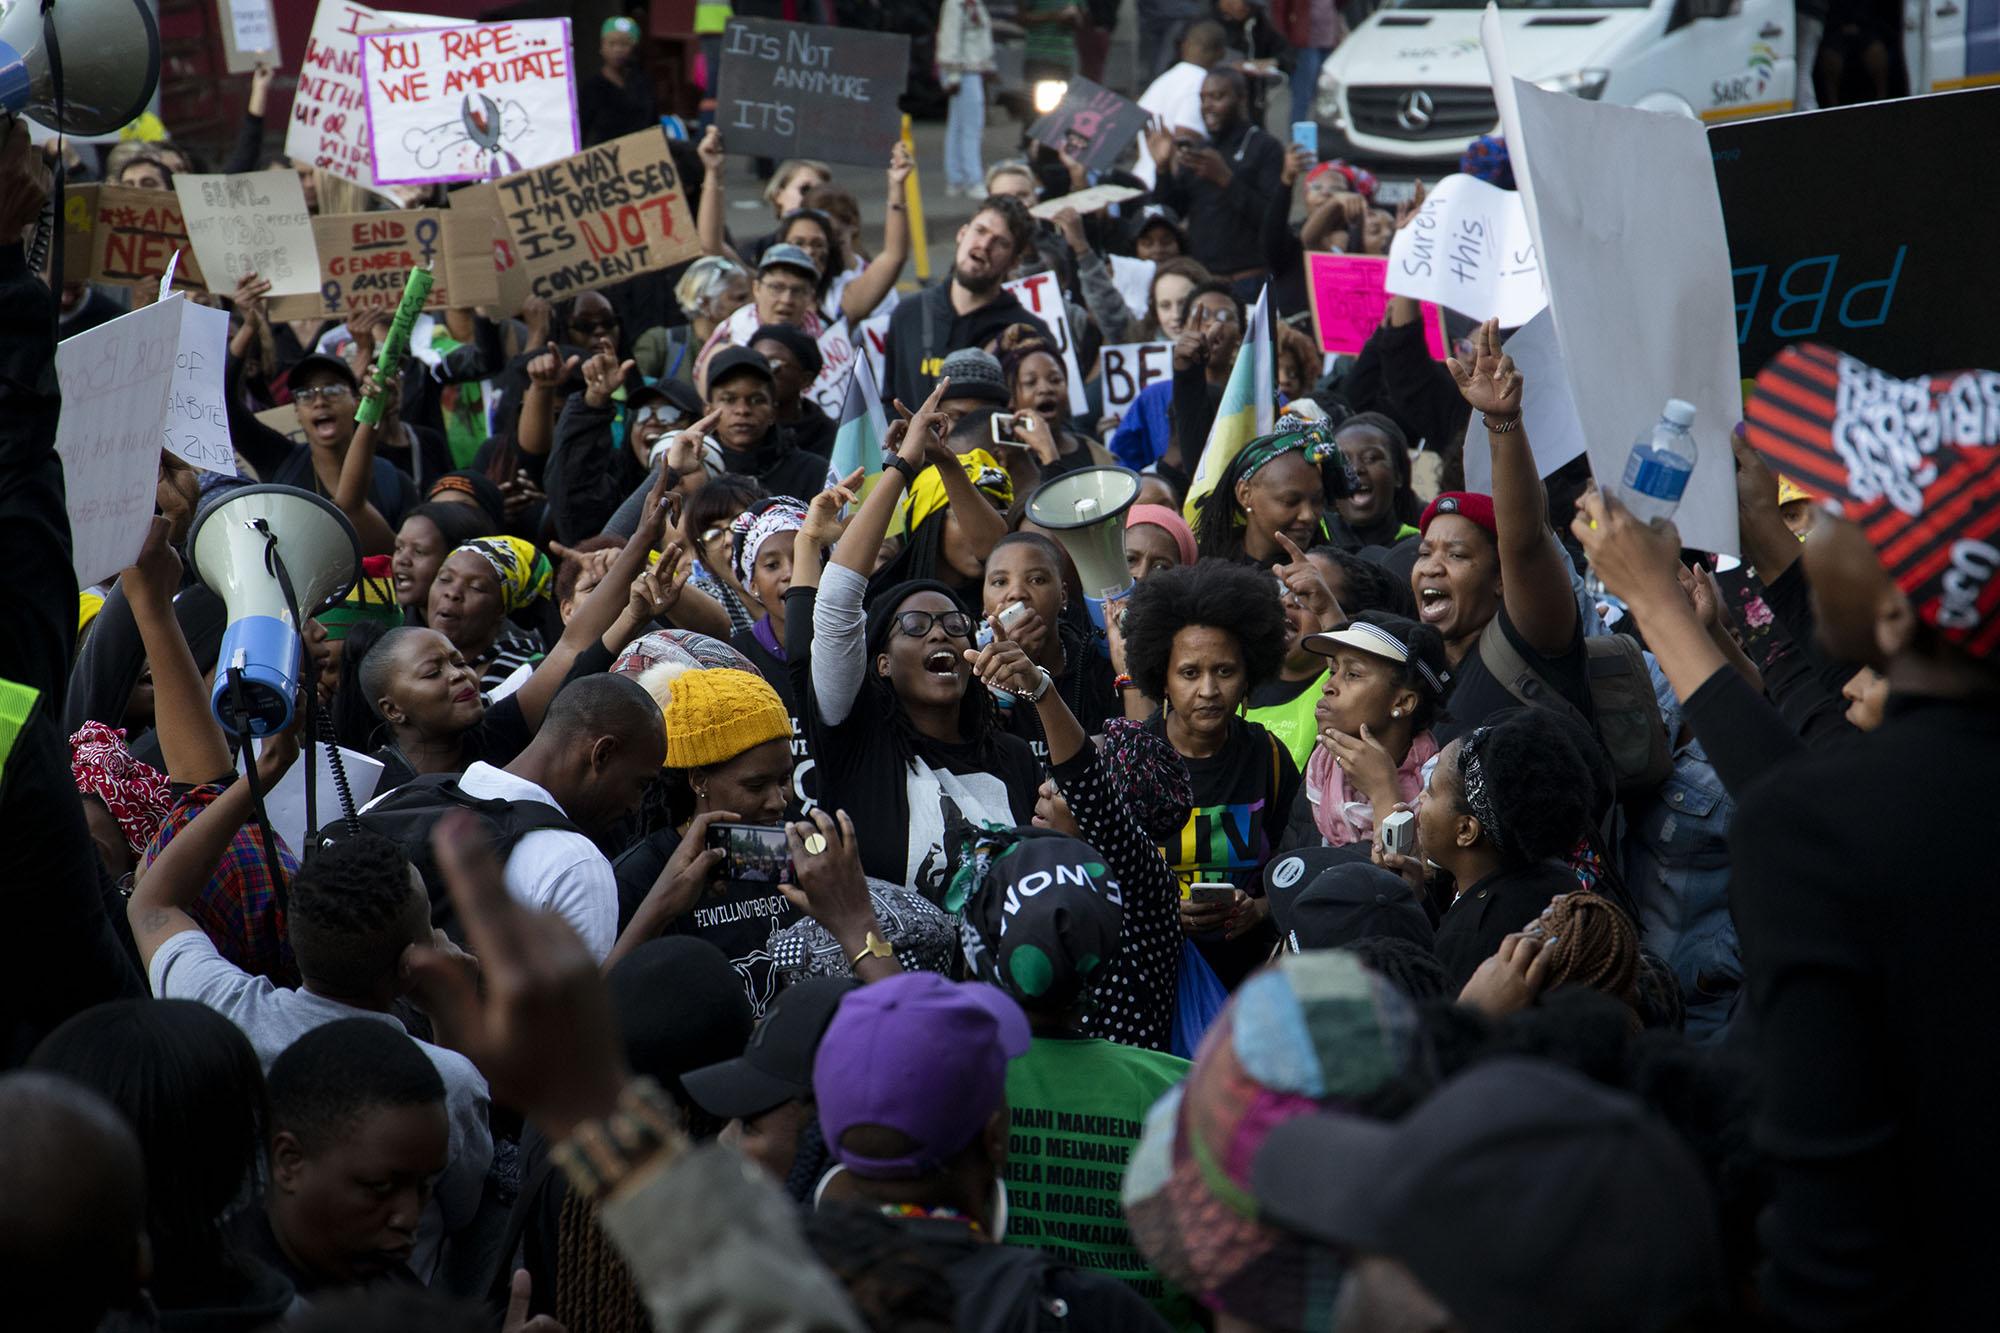 #SandtonShutdown: 'Stop killing us, stop raping us, stop murdering us'